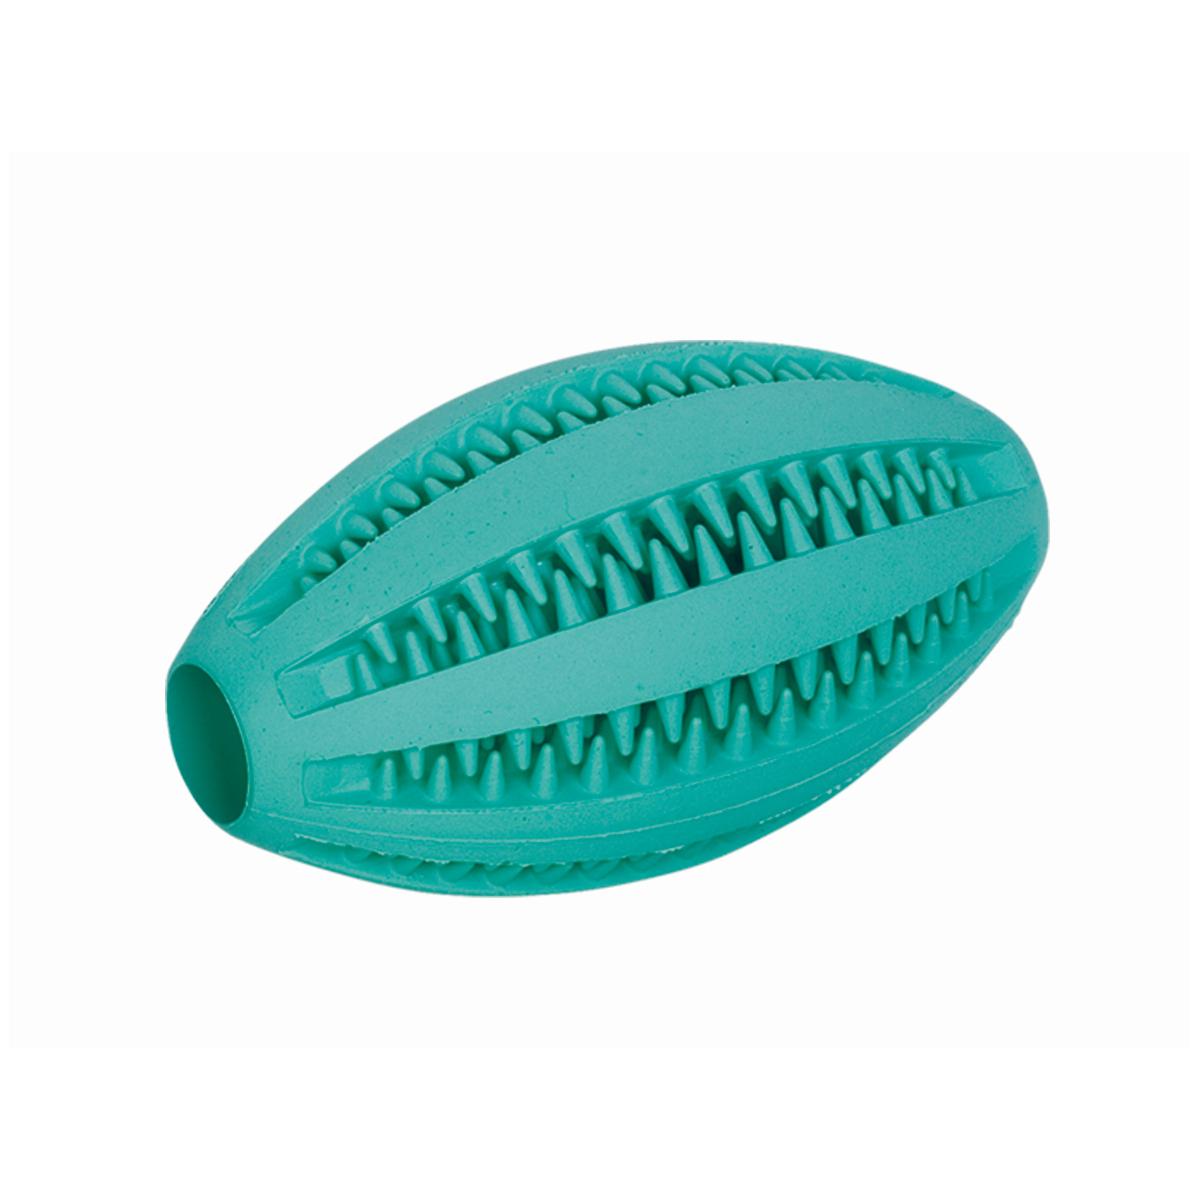 Dental fun rugby bal groen